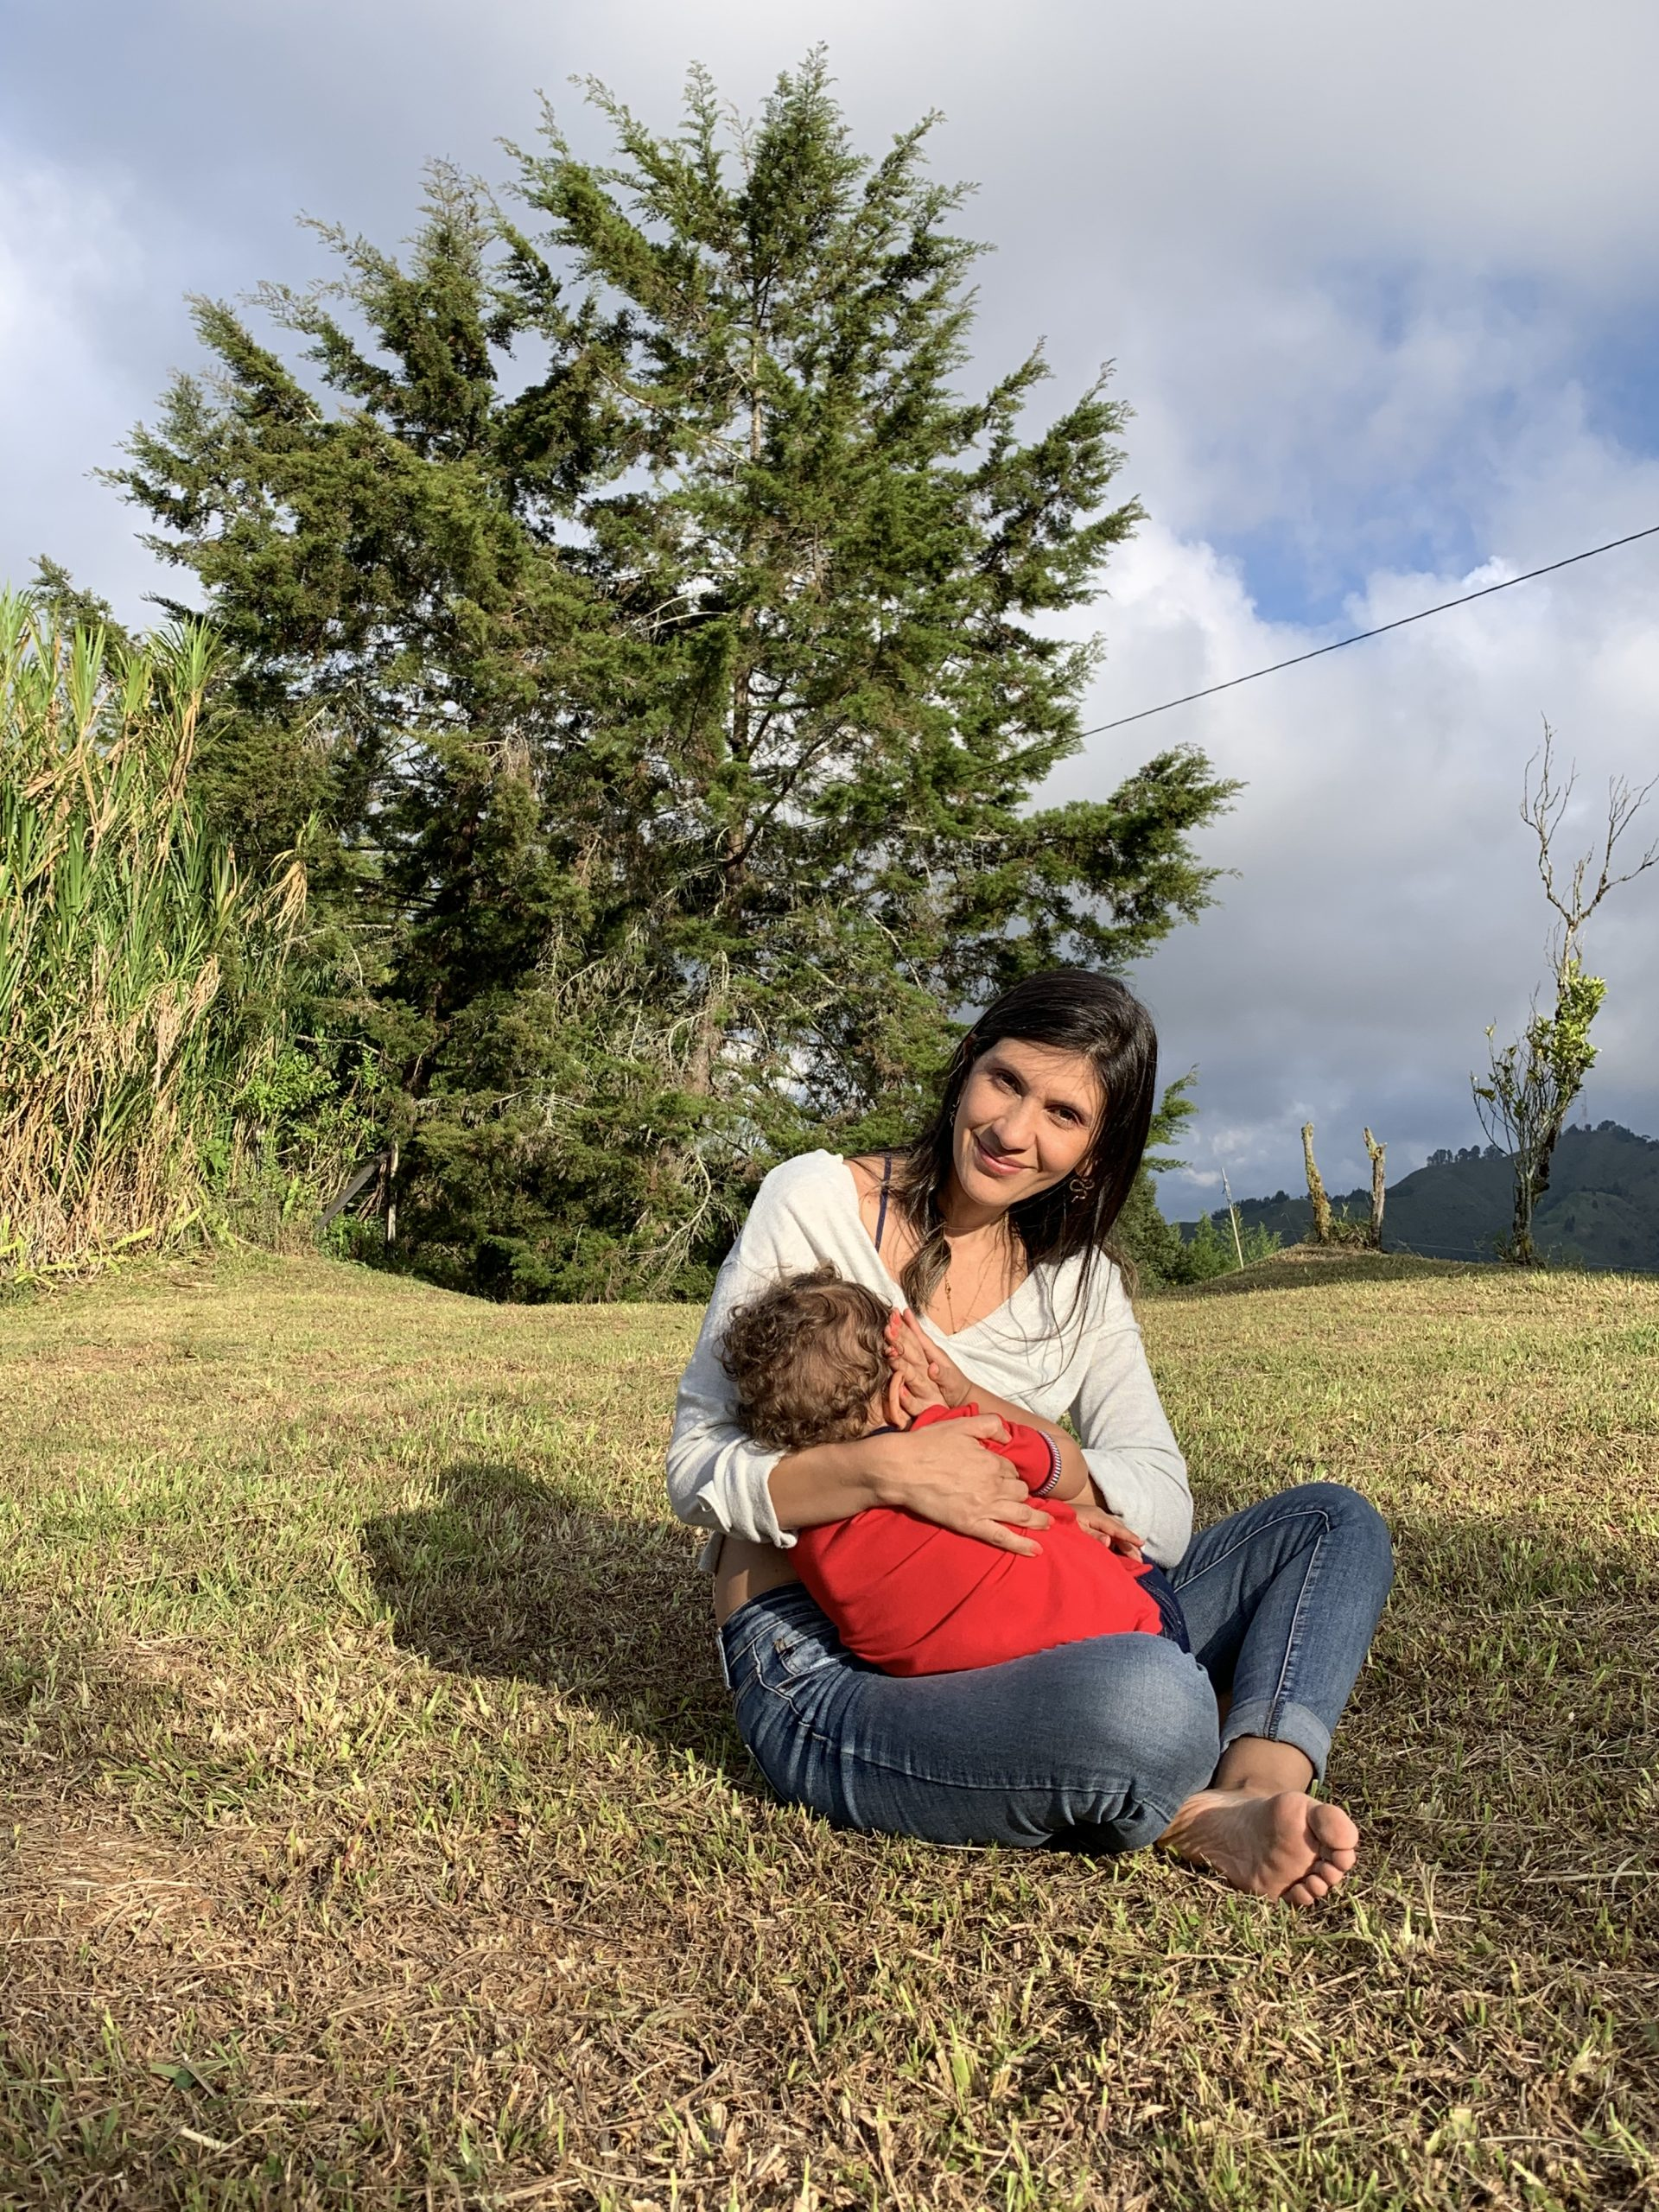 Anabel-hernandez-psicologa-infantil-Medellin-Colombia-crianza-respetuosa